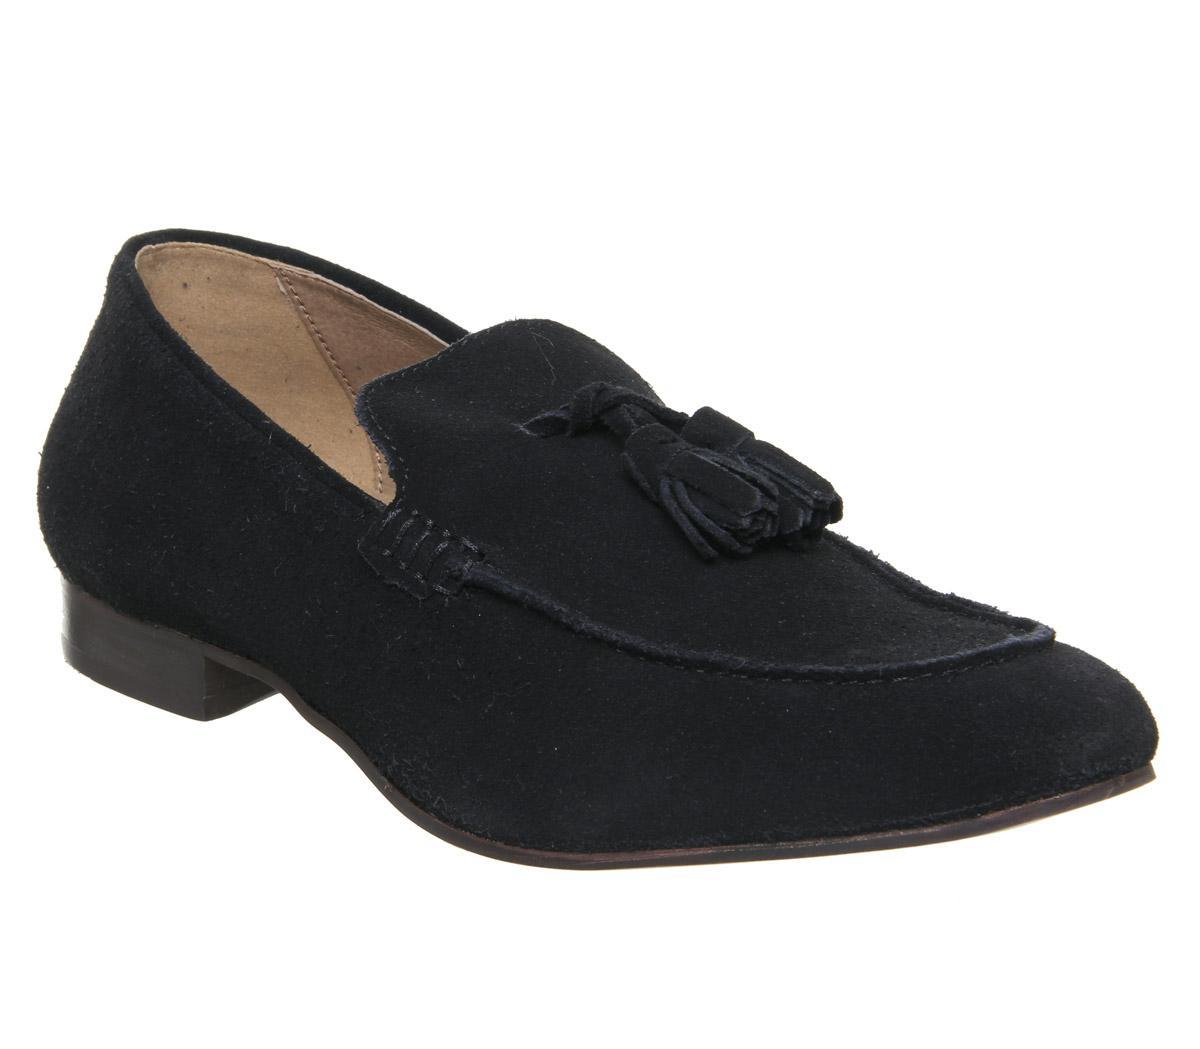 Bolton Tassel Loafers